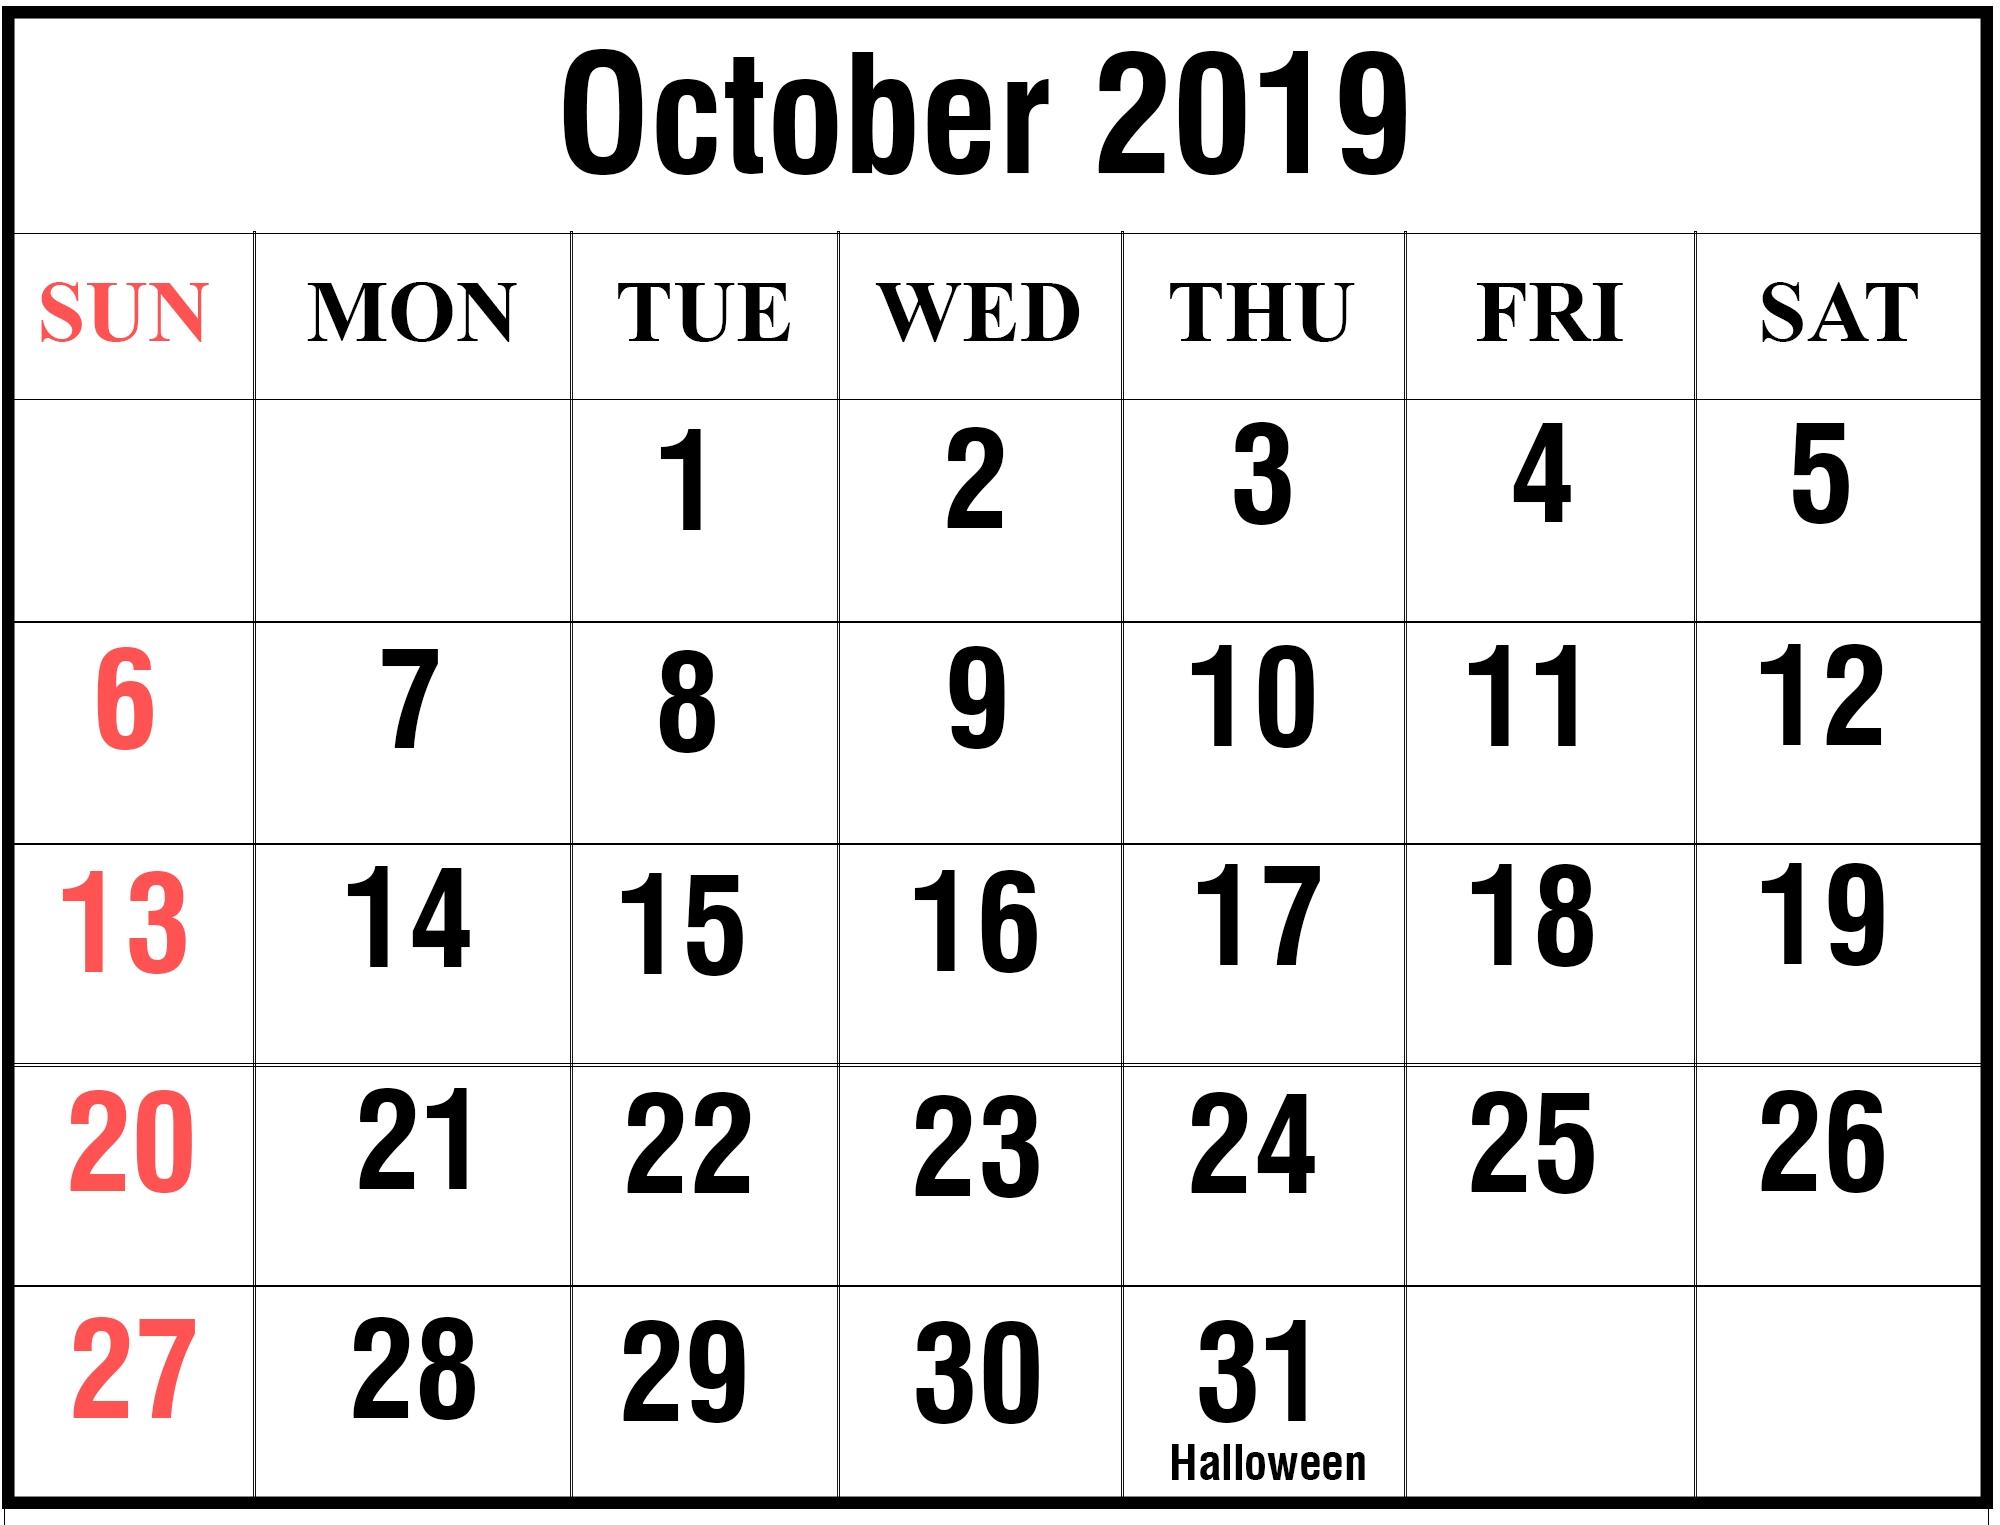 Free Blank October 2019 Printable Calendar In Pdf, Excel-Bill Calendar 2020 Templates